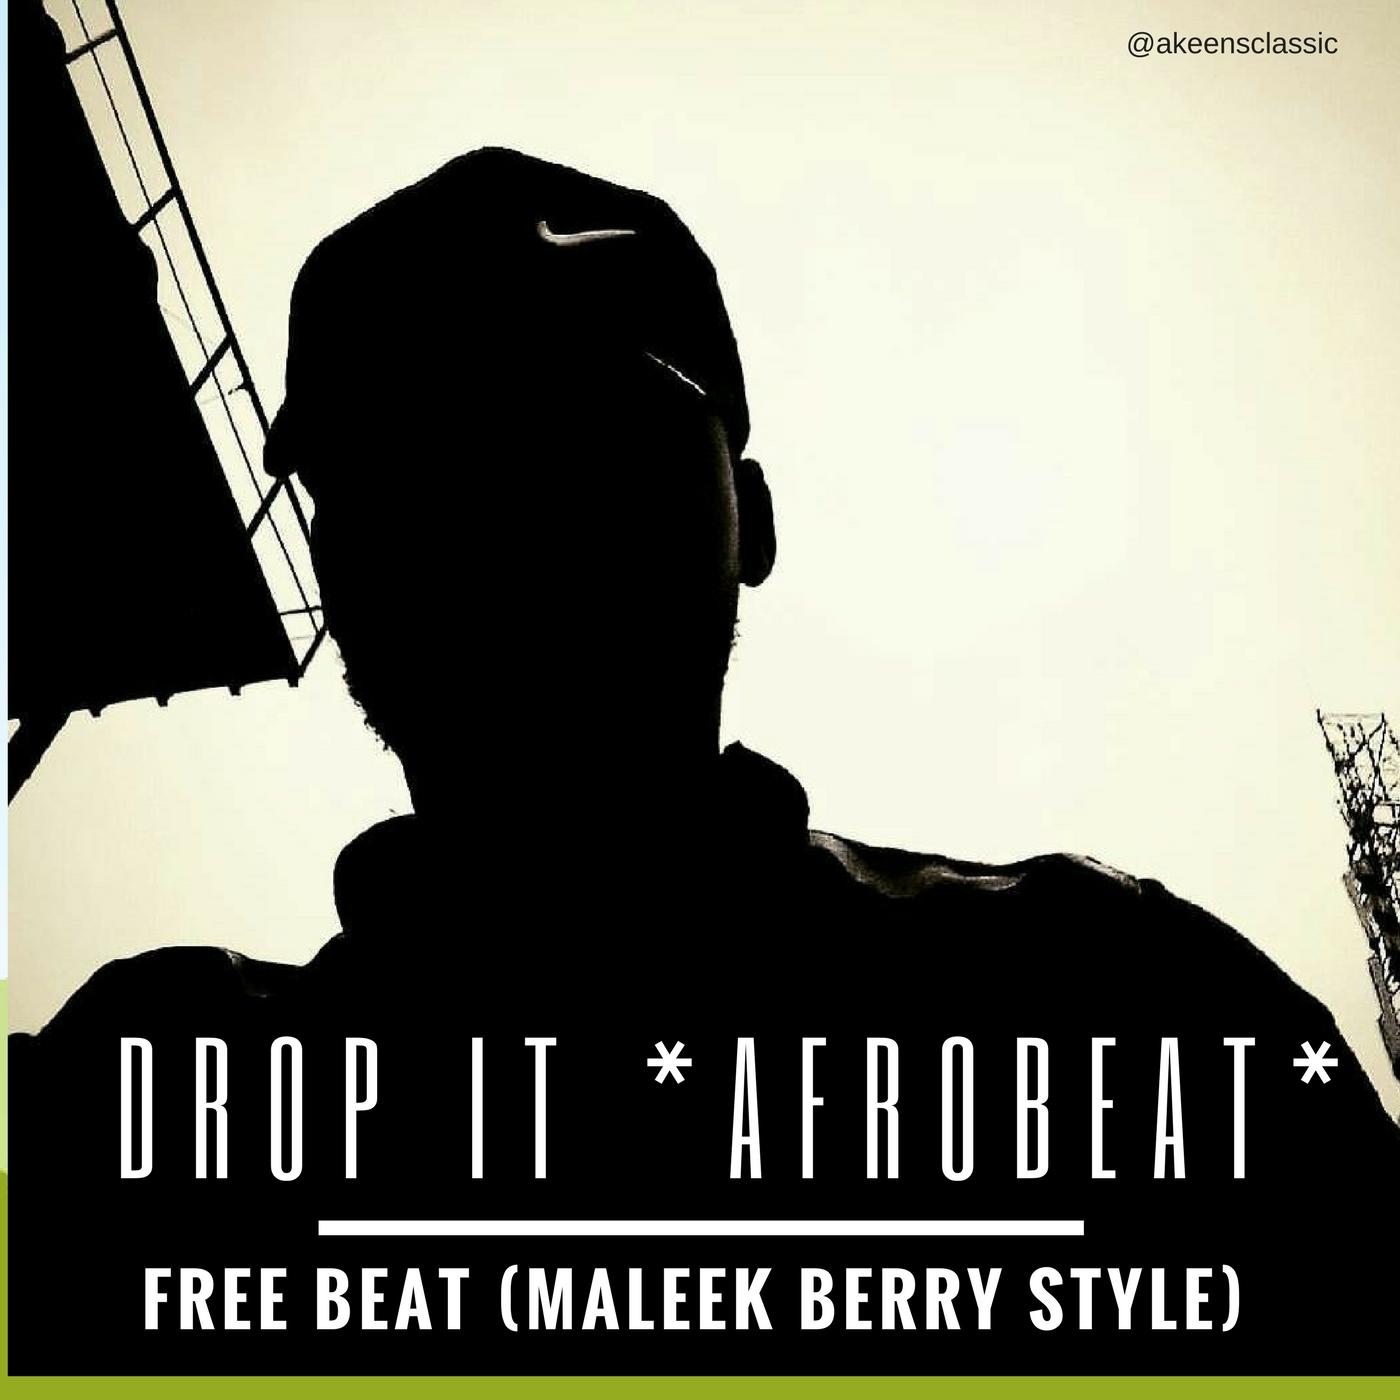 FREE BEAT: DROP IT (AFROBEAT INSTRUMENTAL PROD  AKEENS